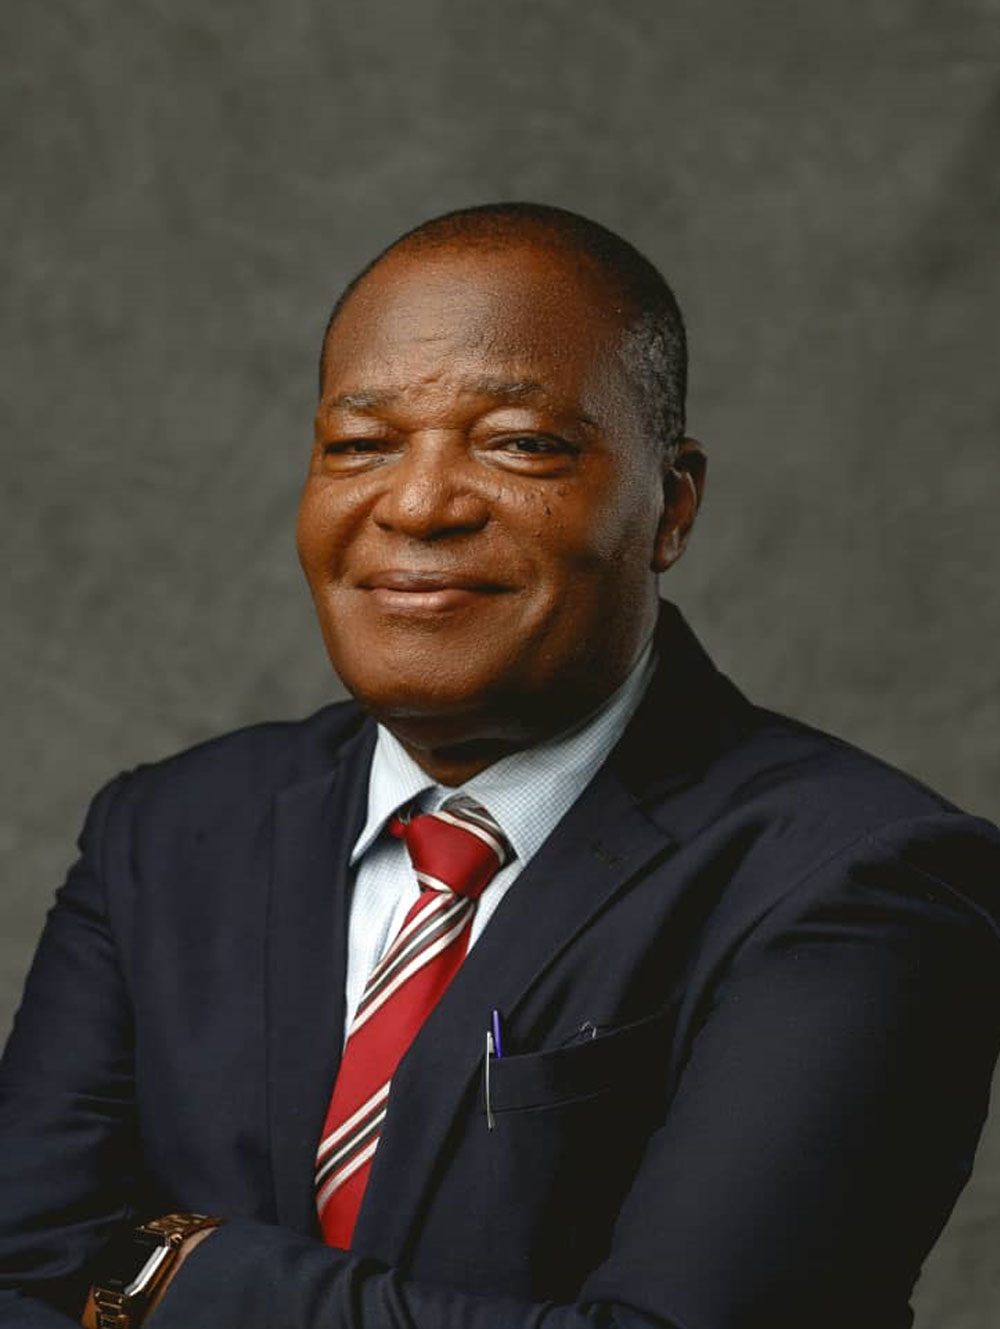 Nasir Adewale Bolaji